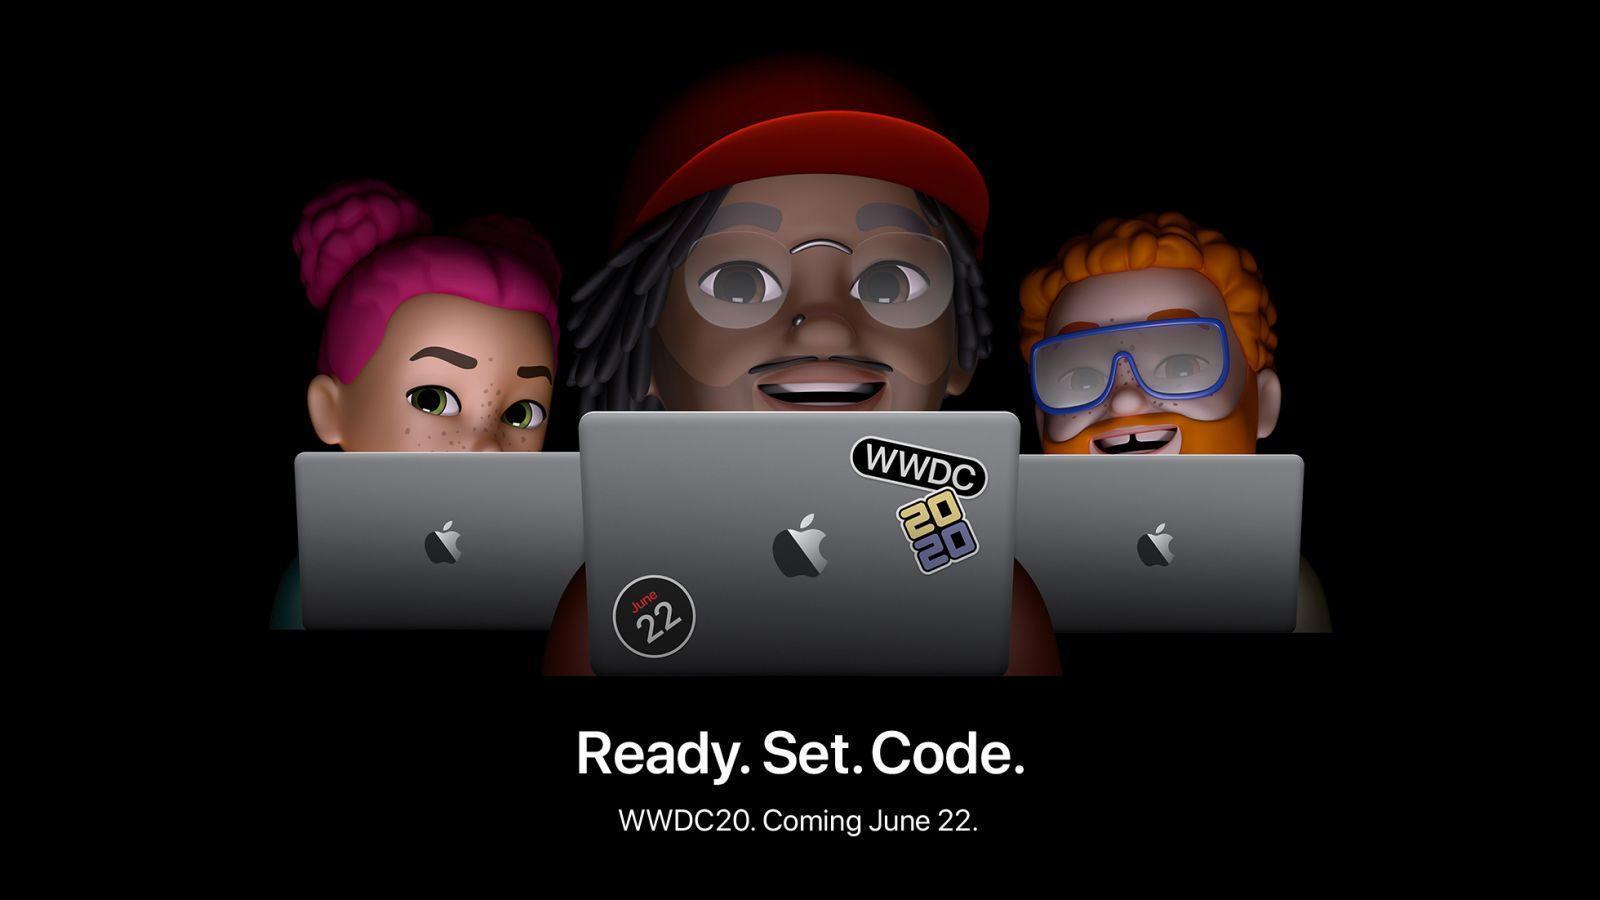 Конференция разработчиков Apple WWDC 2020 начнётся 22 июня (apple wwdc announcement ready set code 05052020.0)